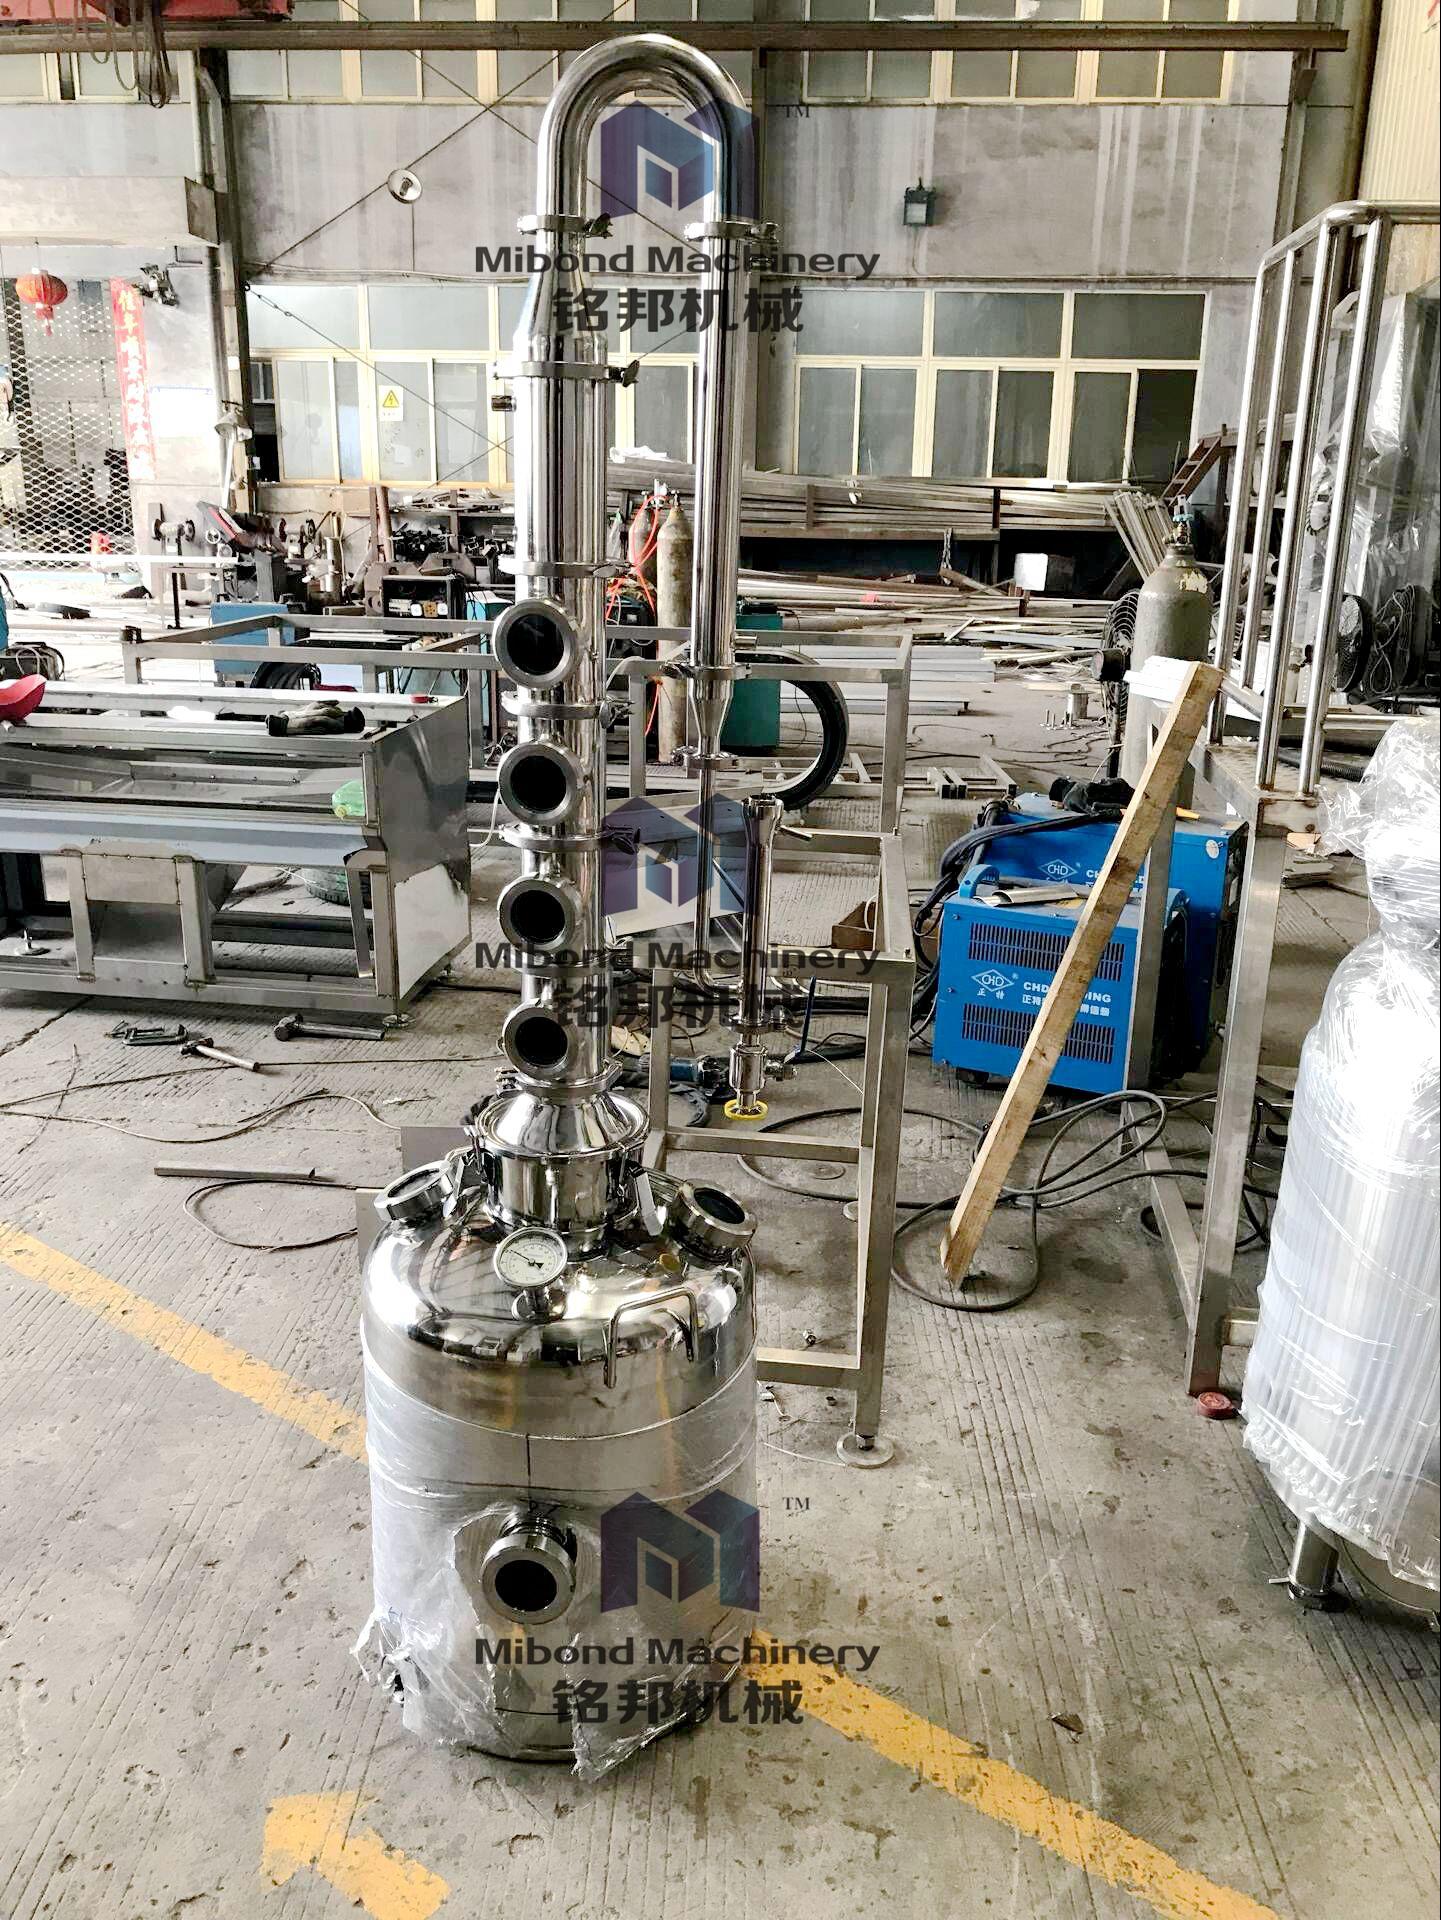 50/100/200 Liter Sectional Stainless Steel/copper Alcohol Moonshine Reflux  Still/distillation Column Price - Buy 50 Liter Stainless Steel